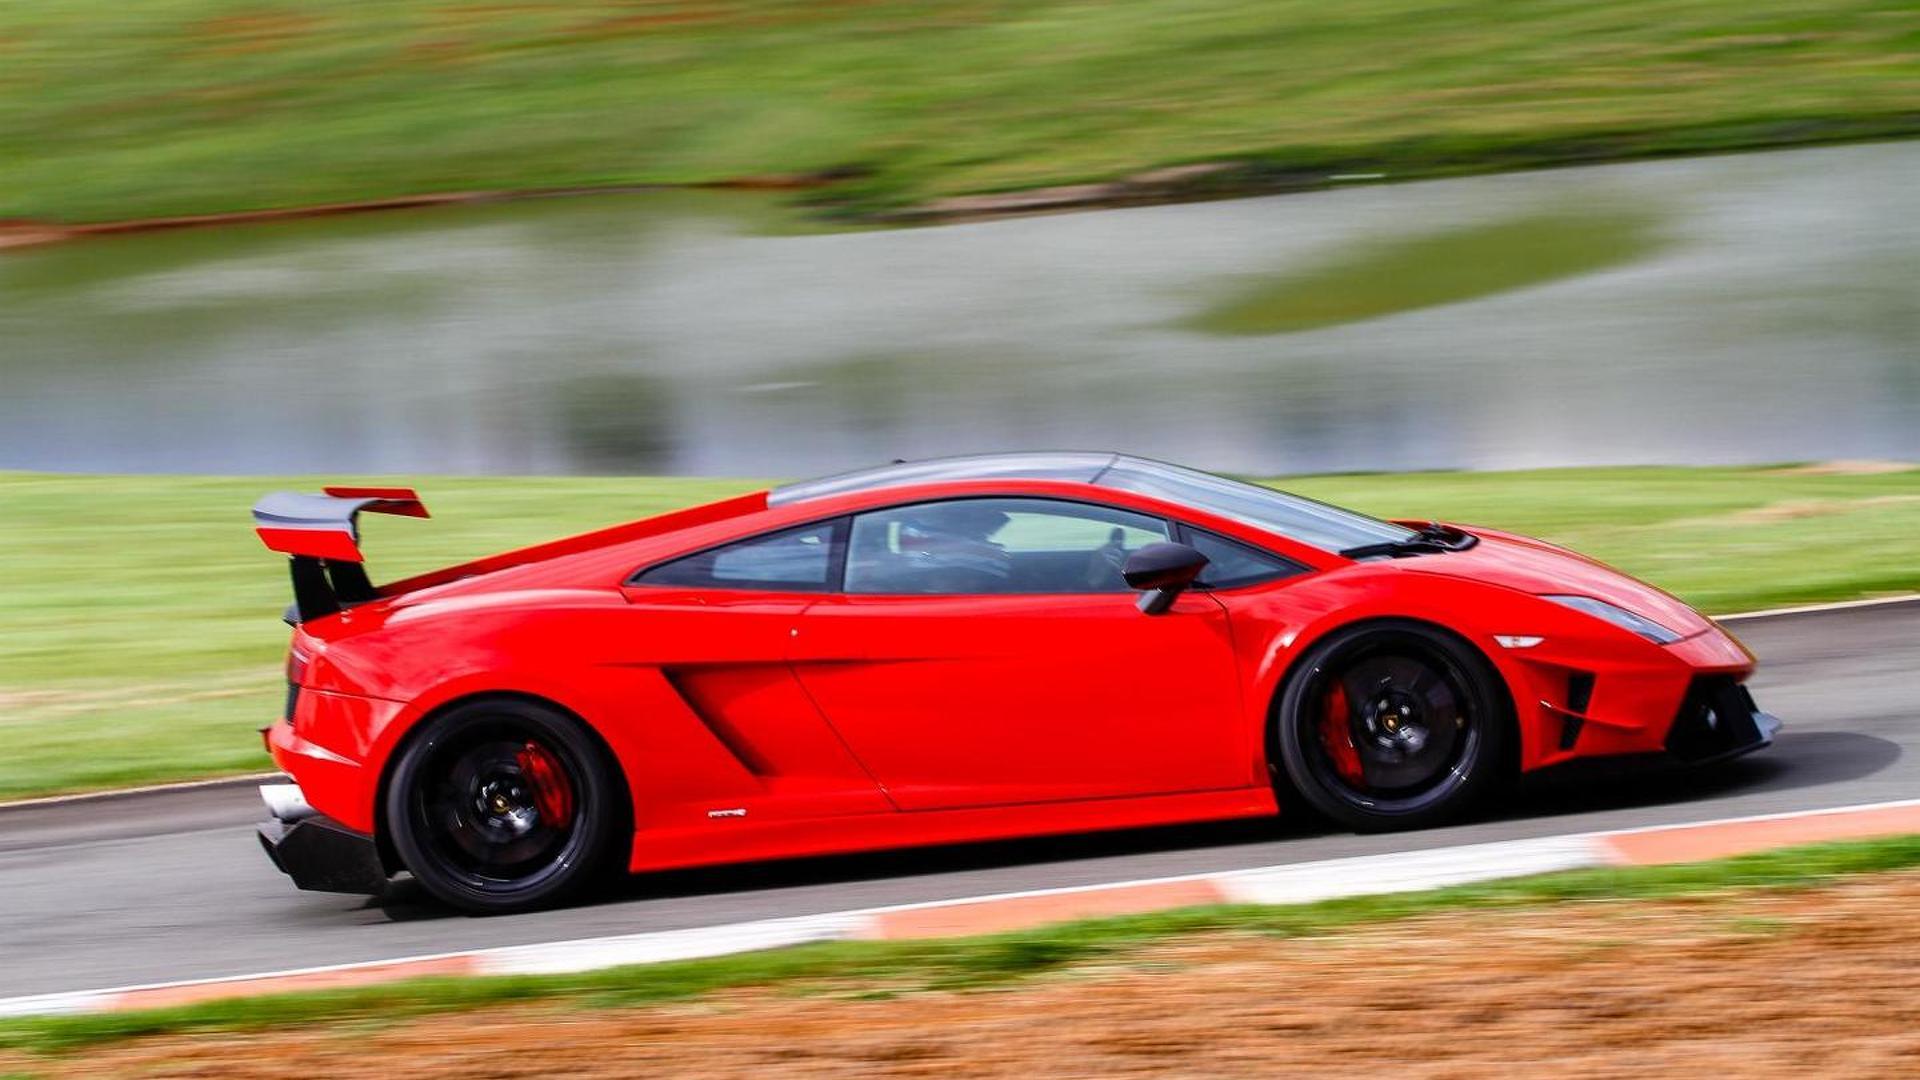 Lamborghini Gallardo Sts 700 By Renm Performance Video